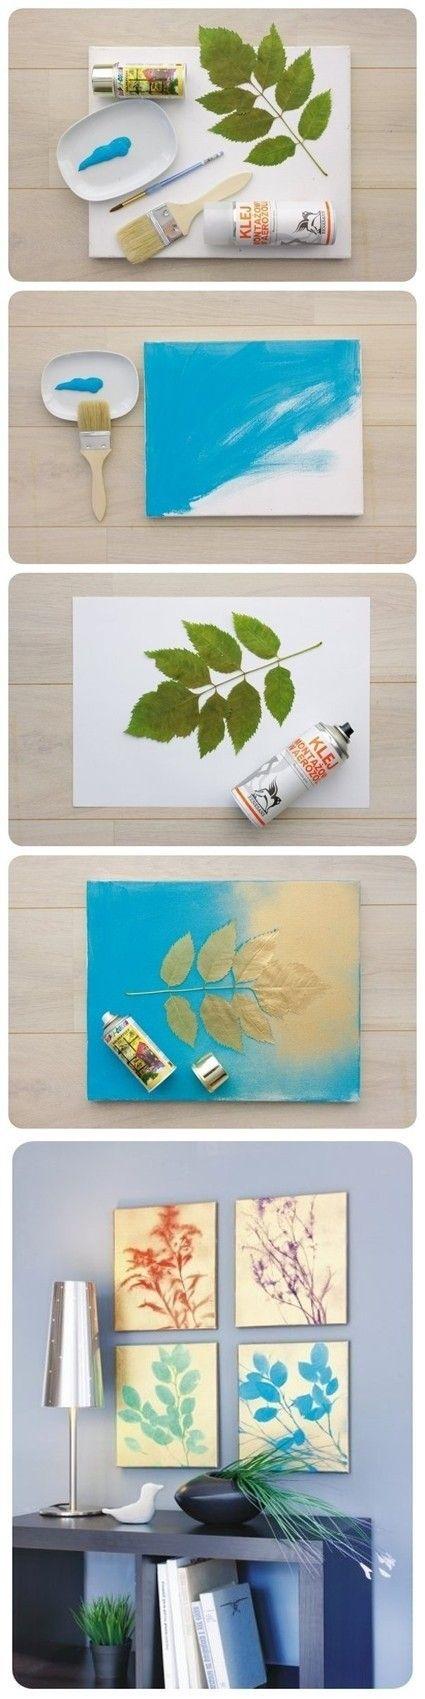 Cool Art idea!